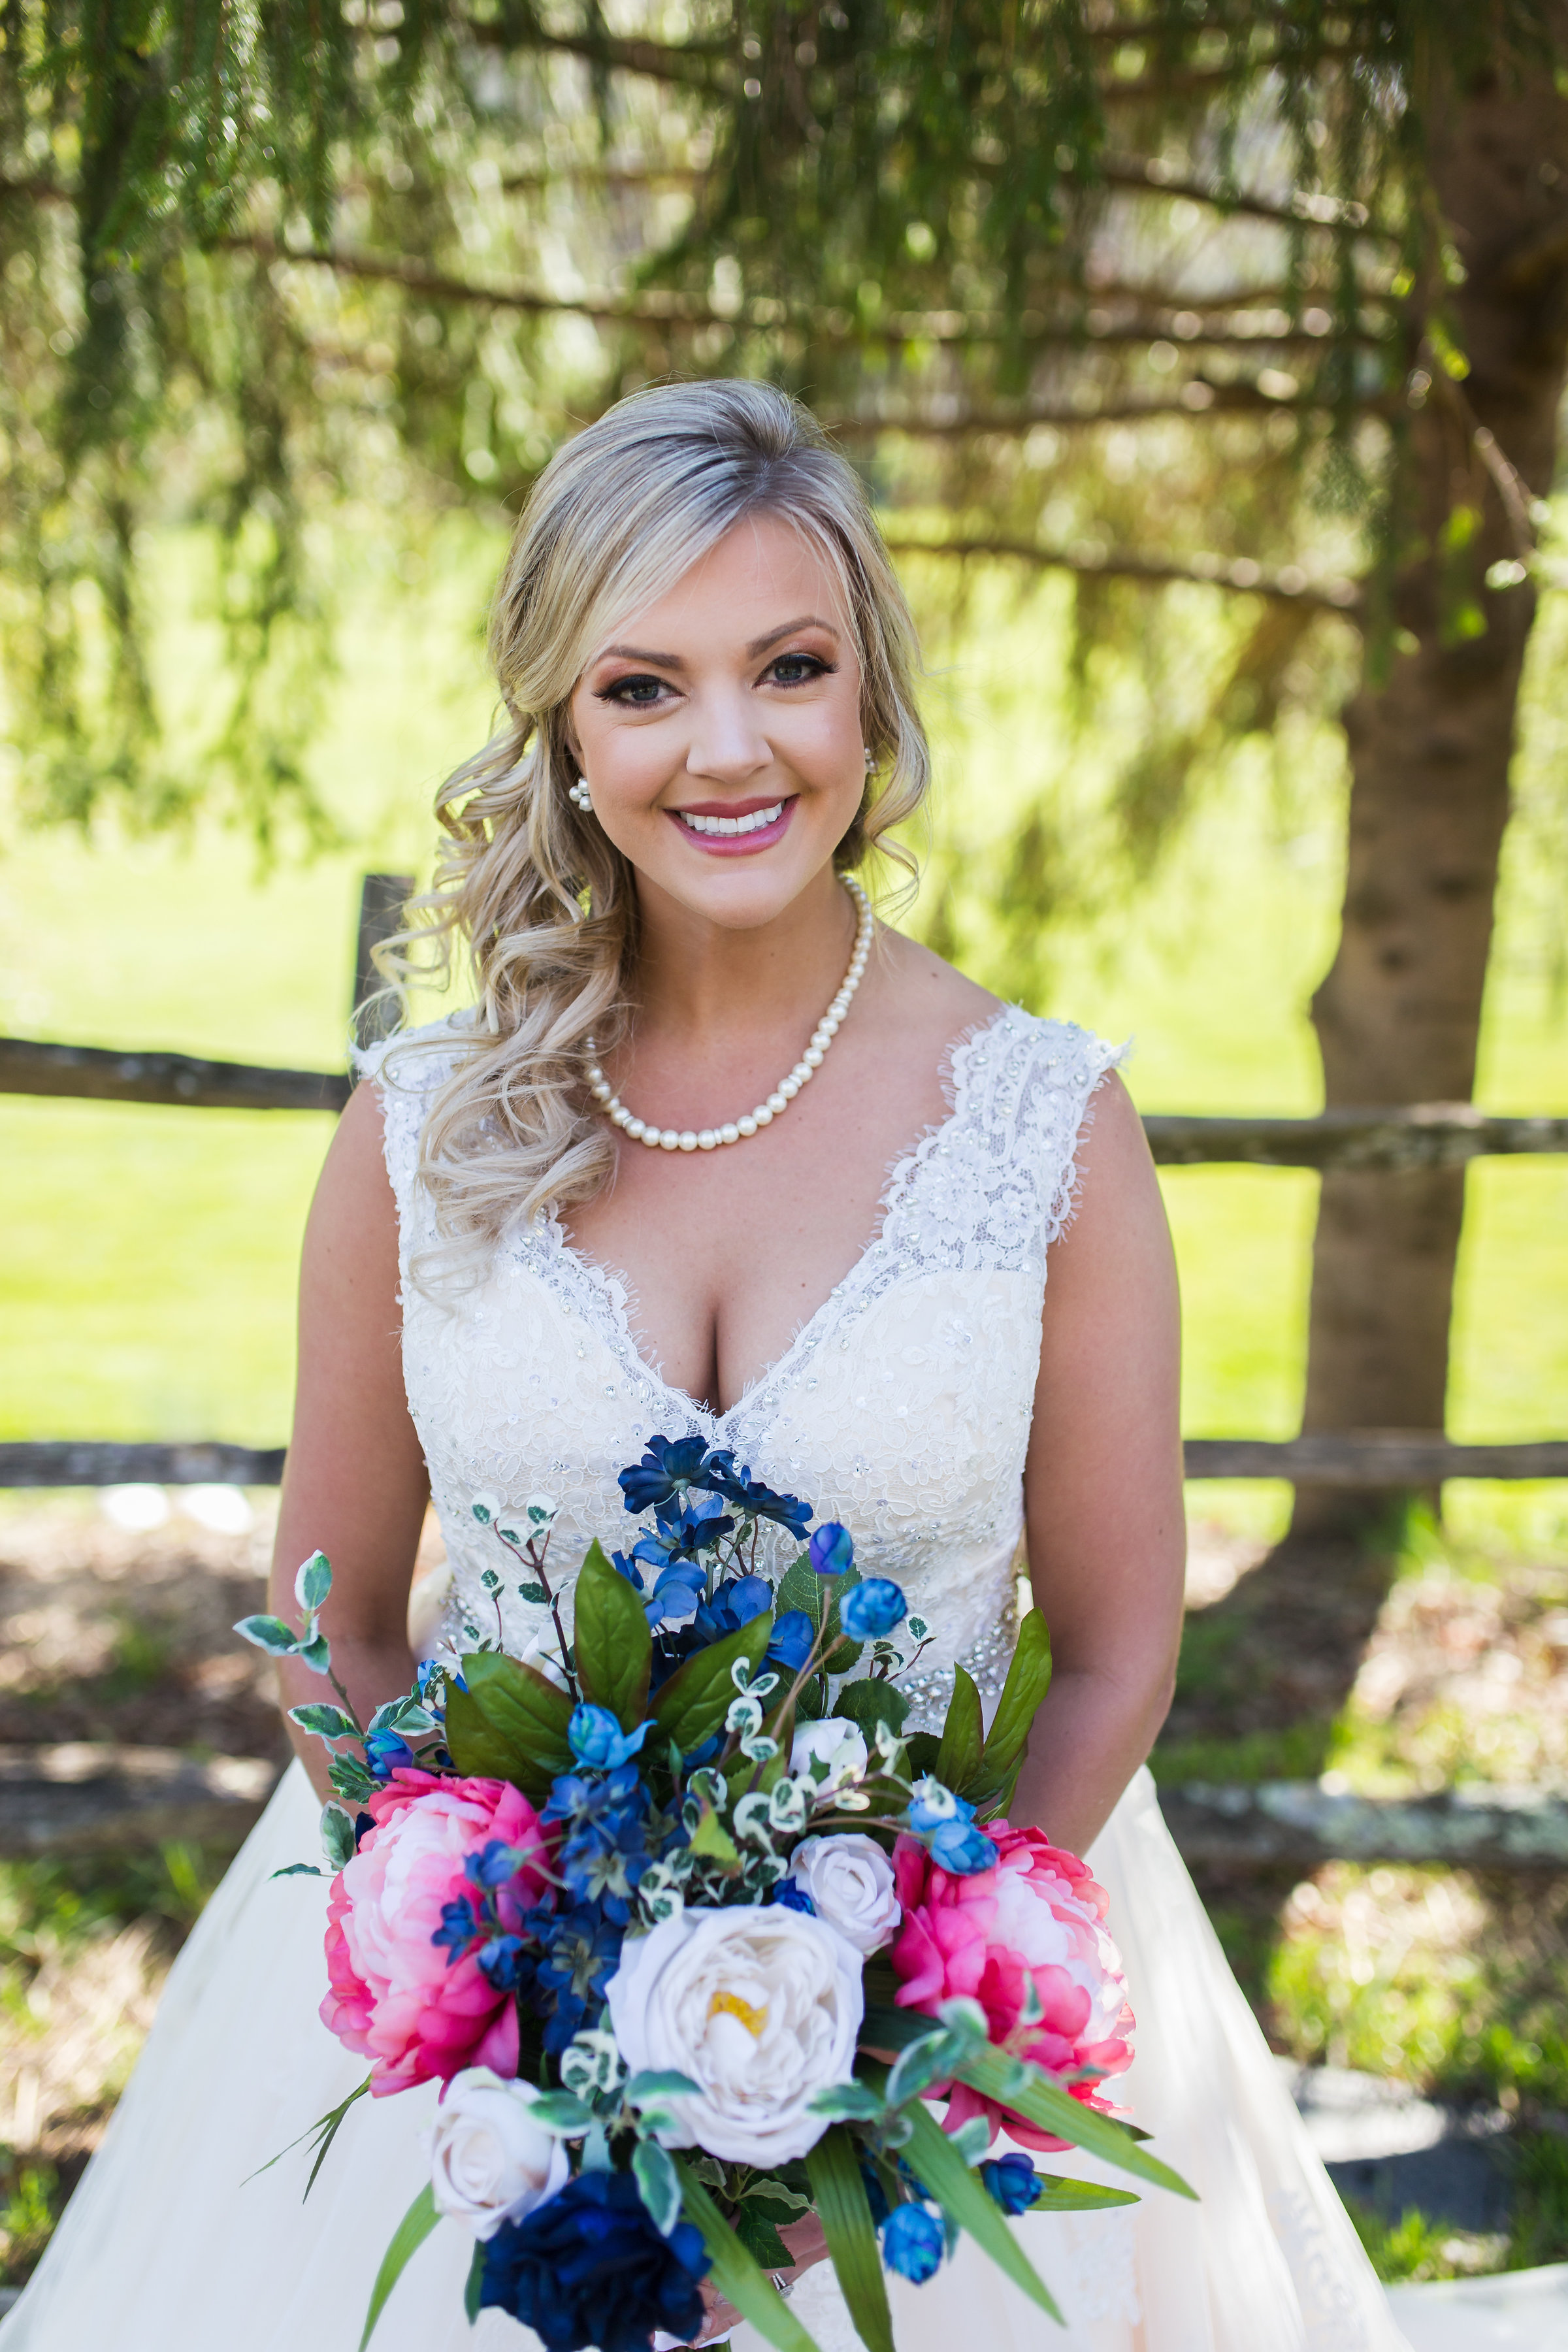 Honeysuckle-Hill-Asheville-Wedding-Venue-Ann-Cordell-Bridal-15.JPG